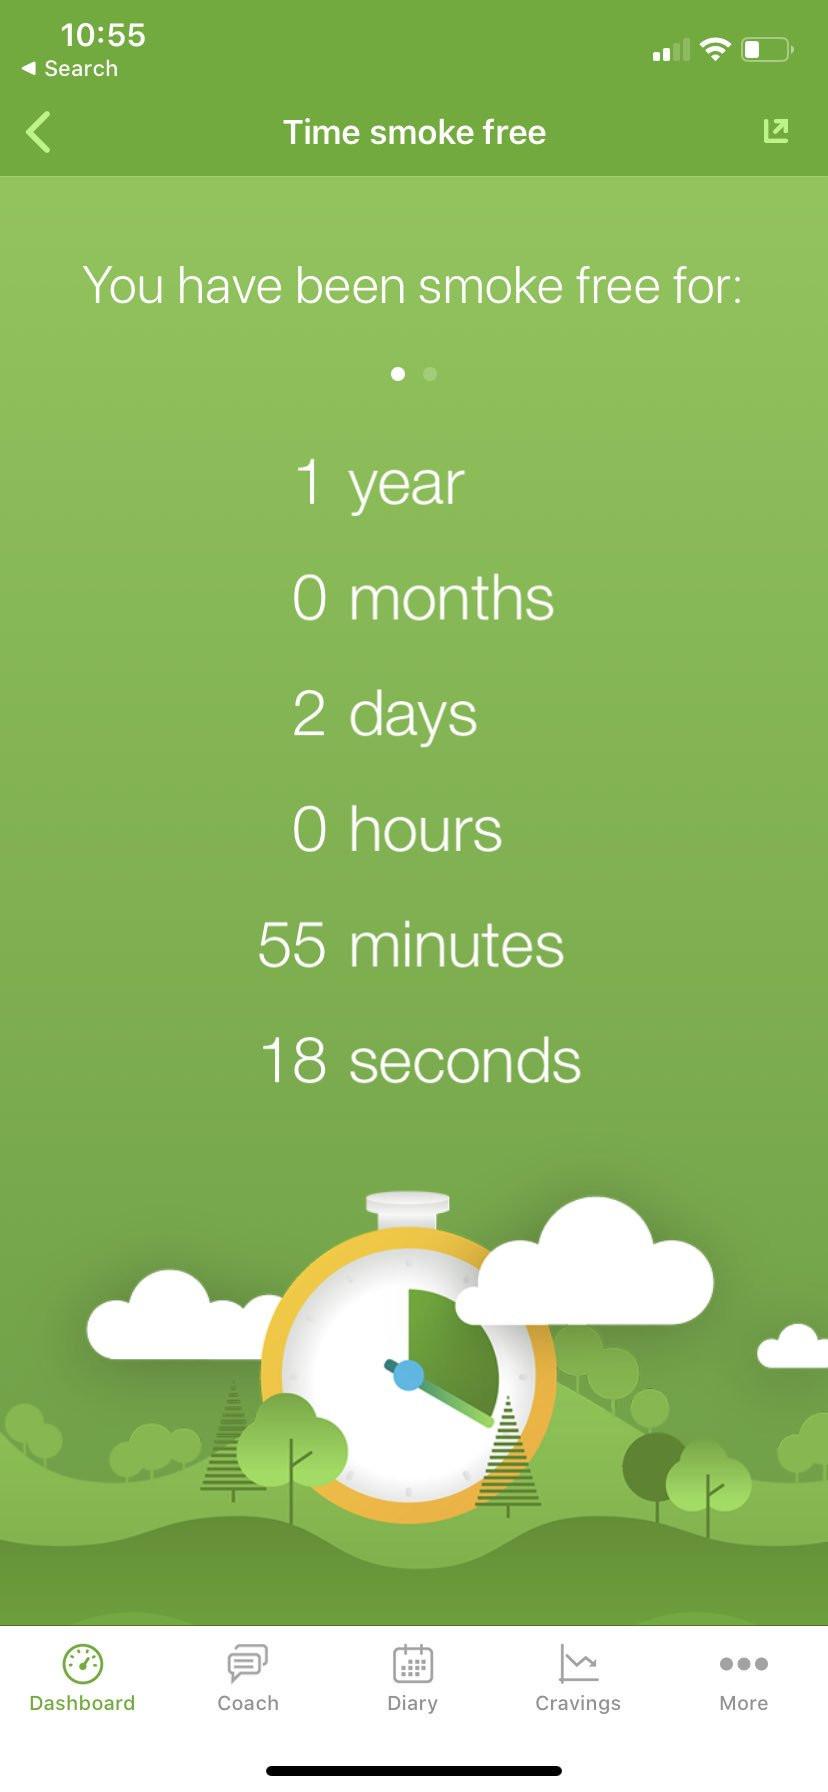 Dr. Sid celebrates milestone achievement of not smoking for a year lindaikejisblog 2